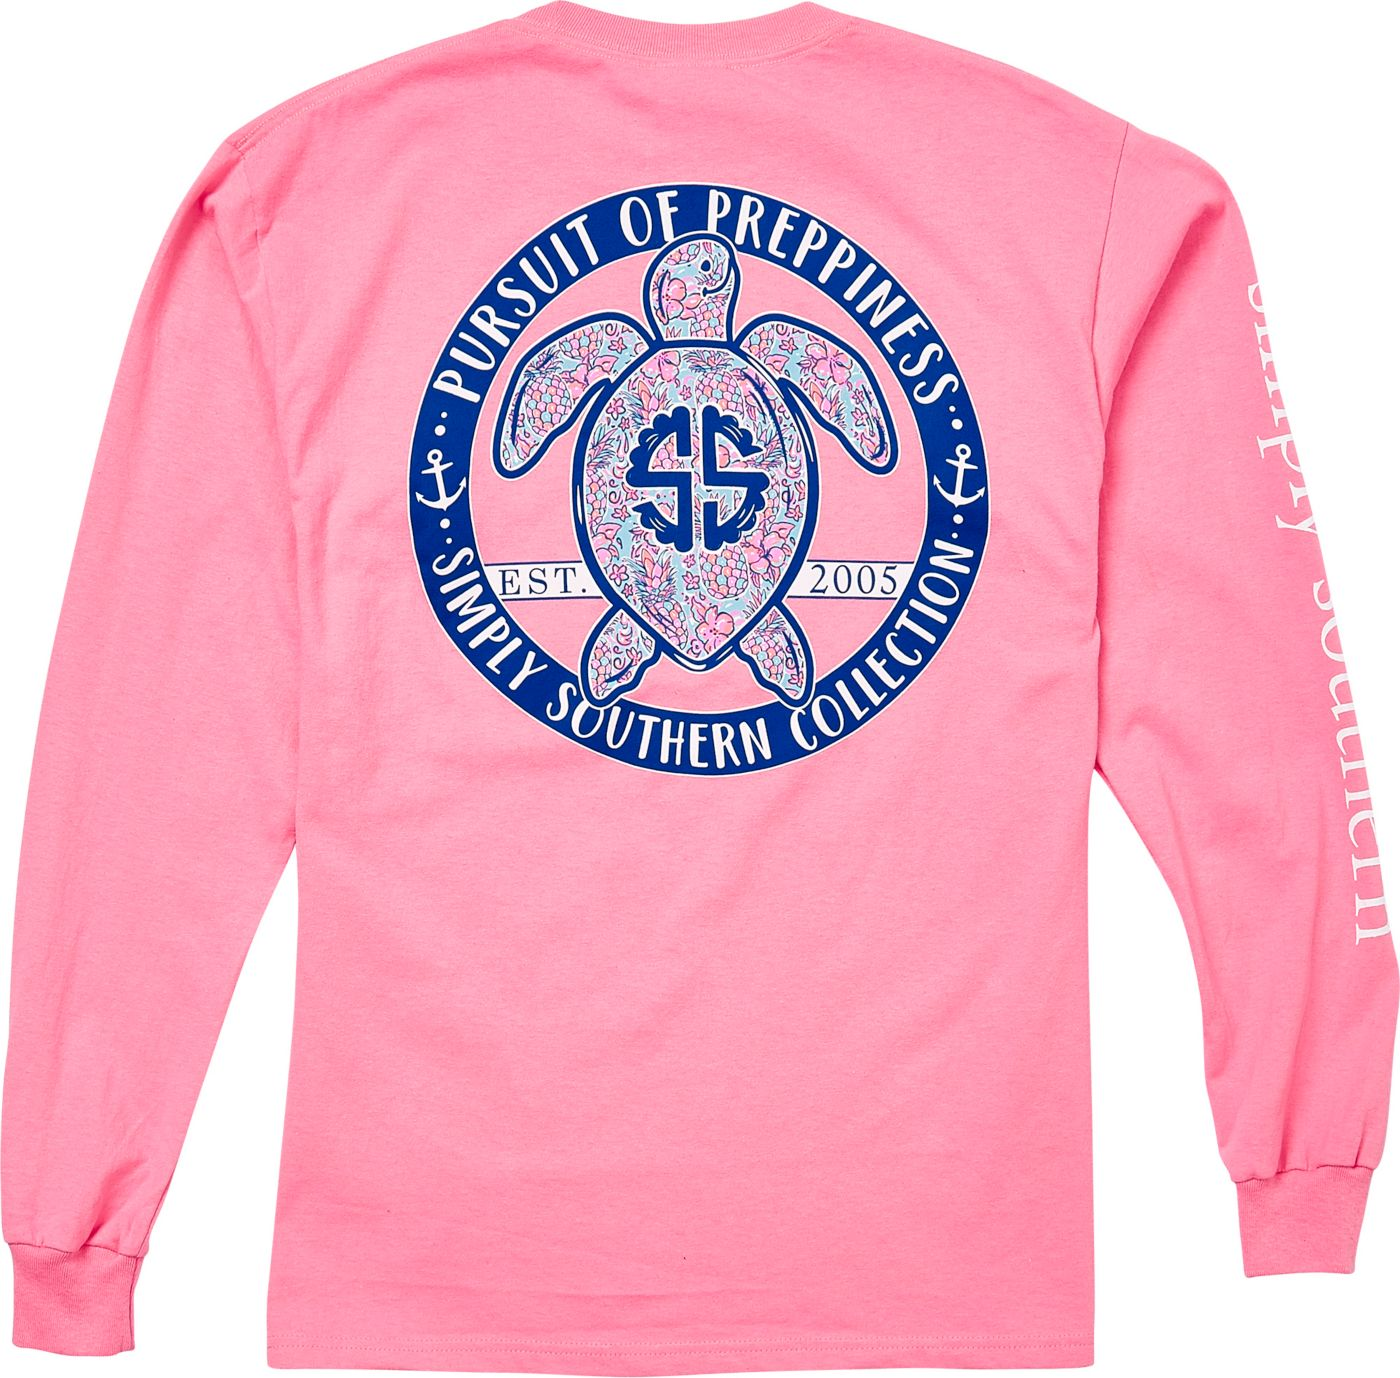 Simply Southern Women's Turtle Prep Long Sleeve T-Shirt